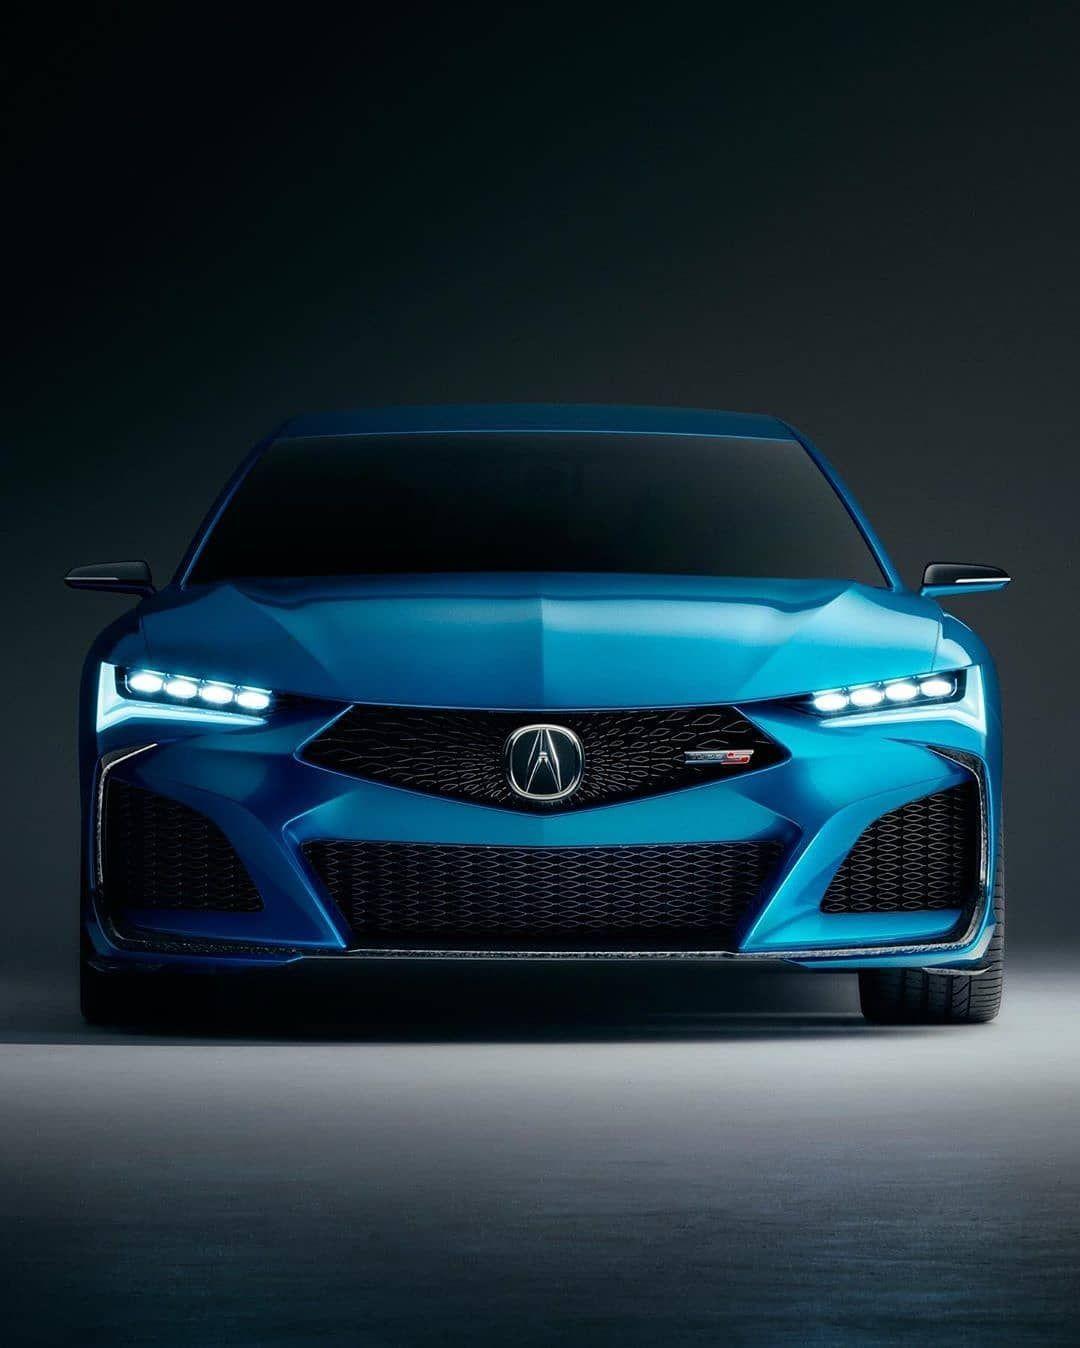 Acura Type S Future Car Concept . . #acura #life